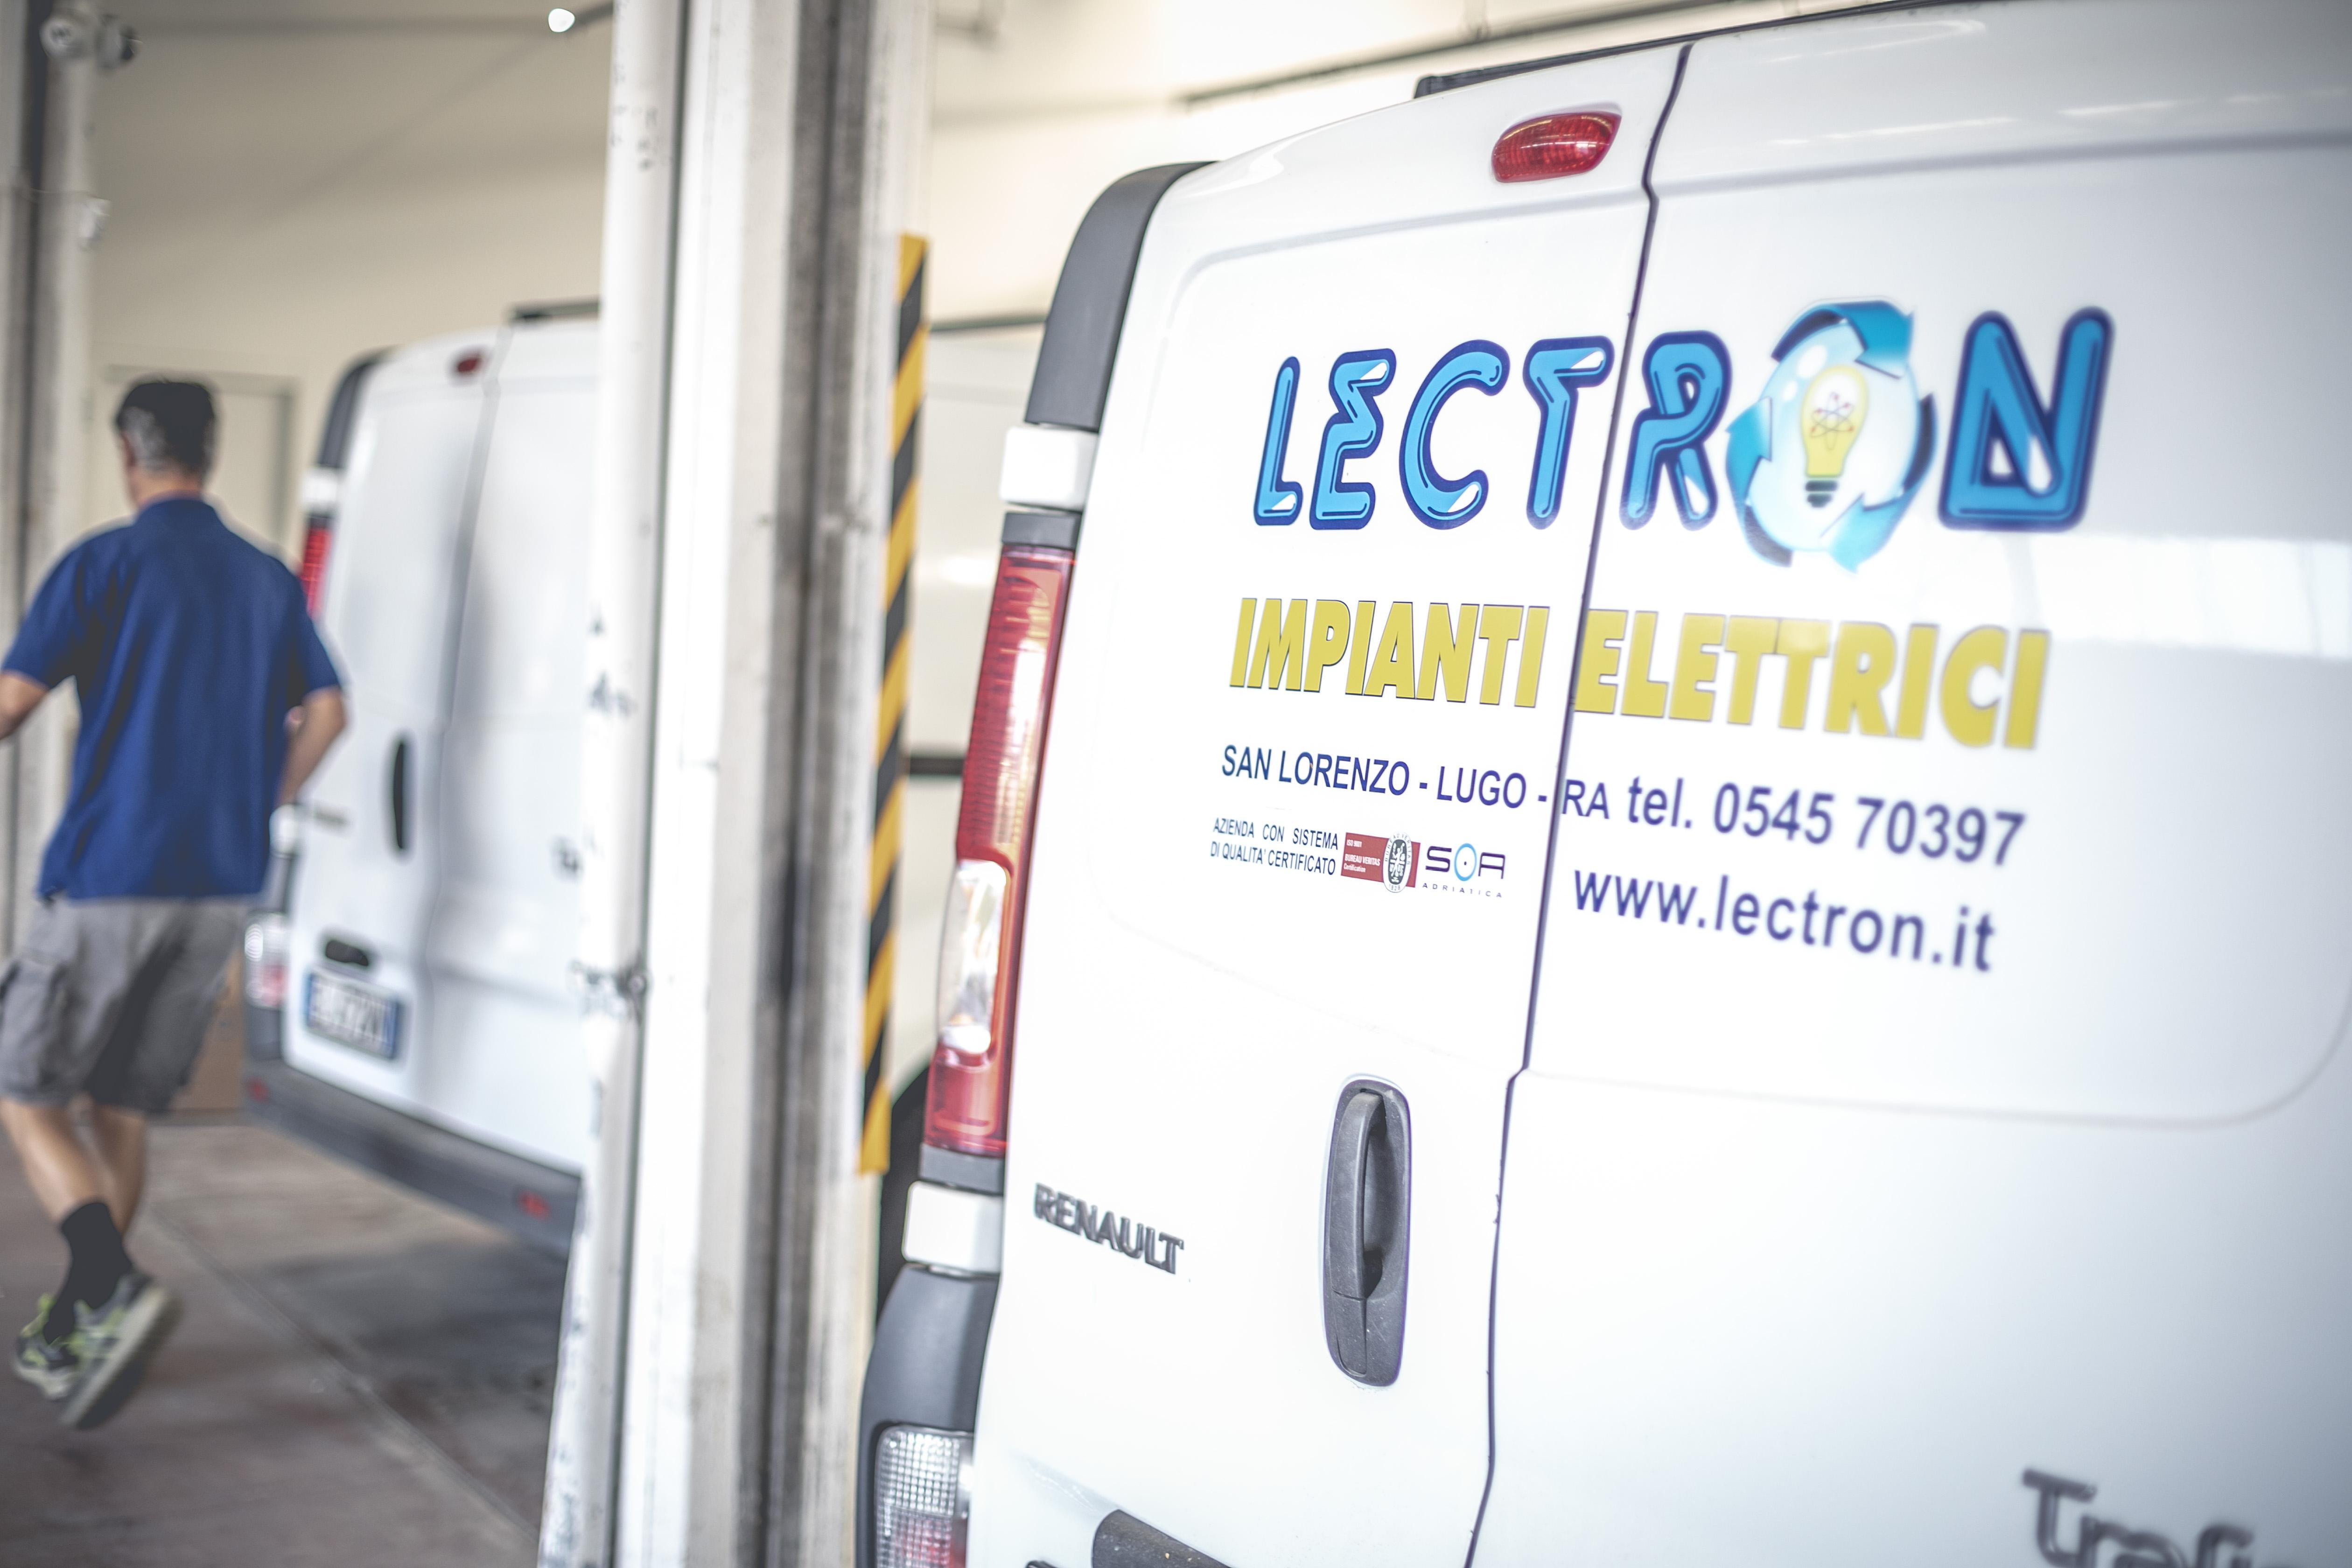 lectron-impianti-elettrici